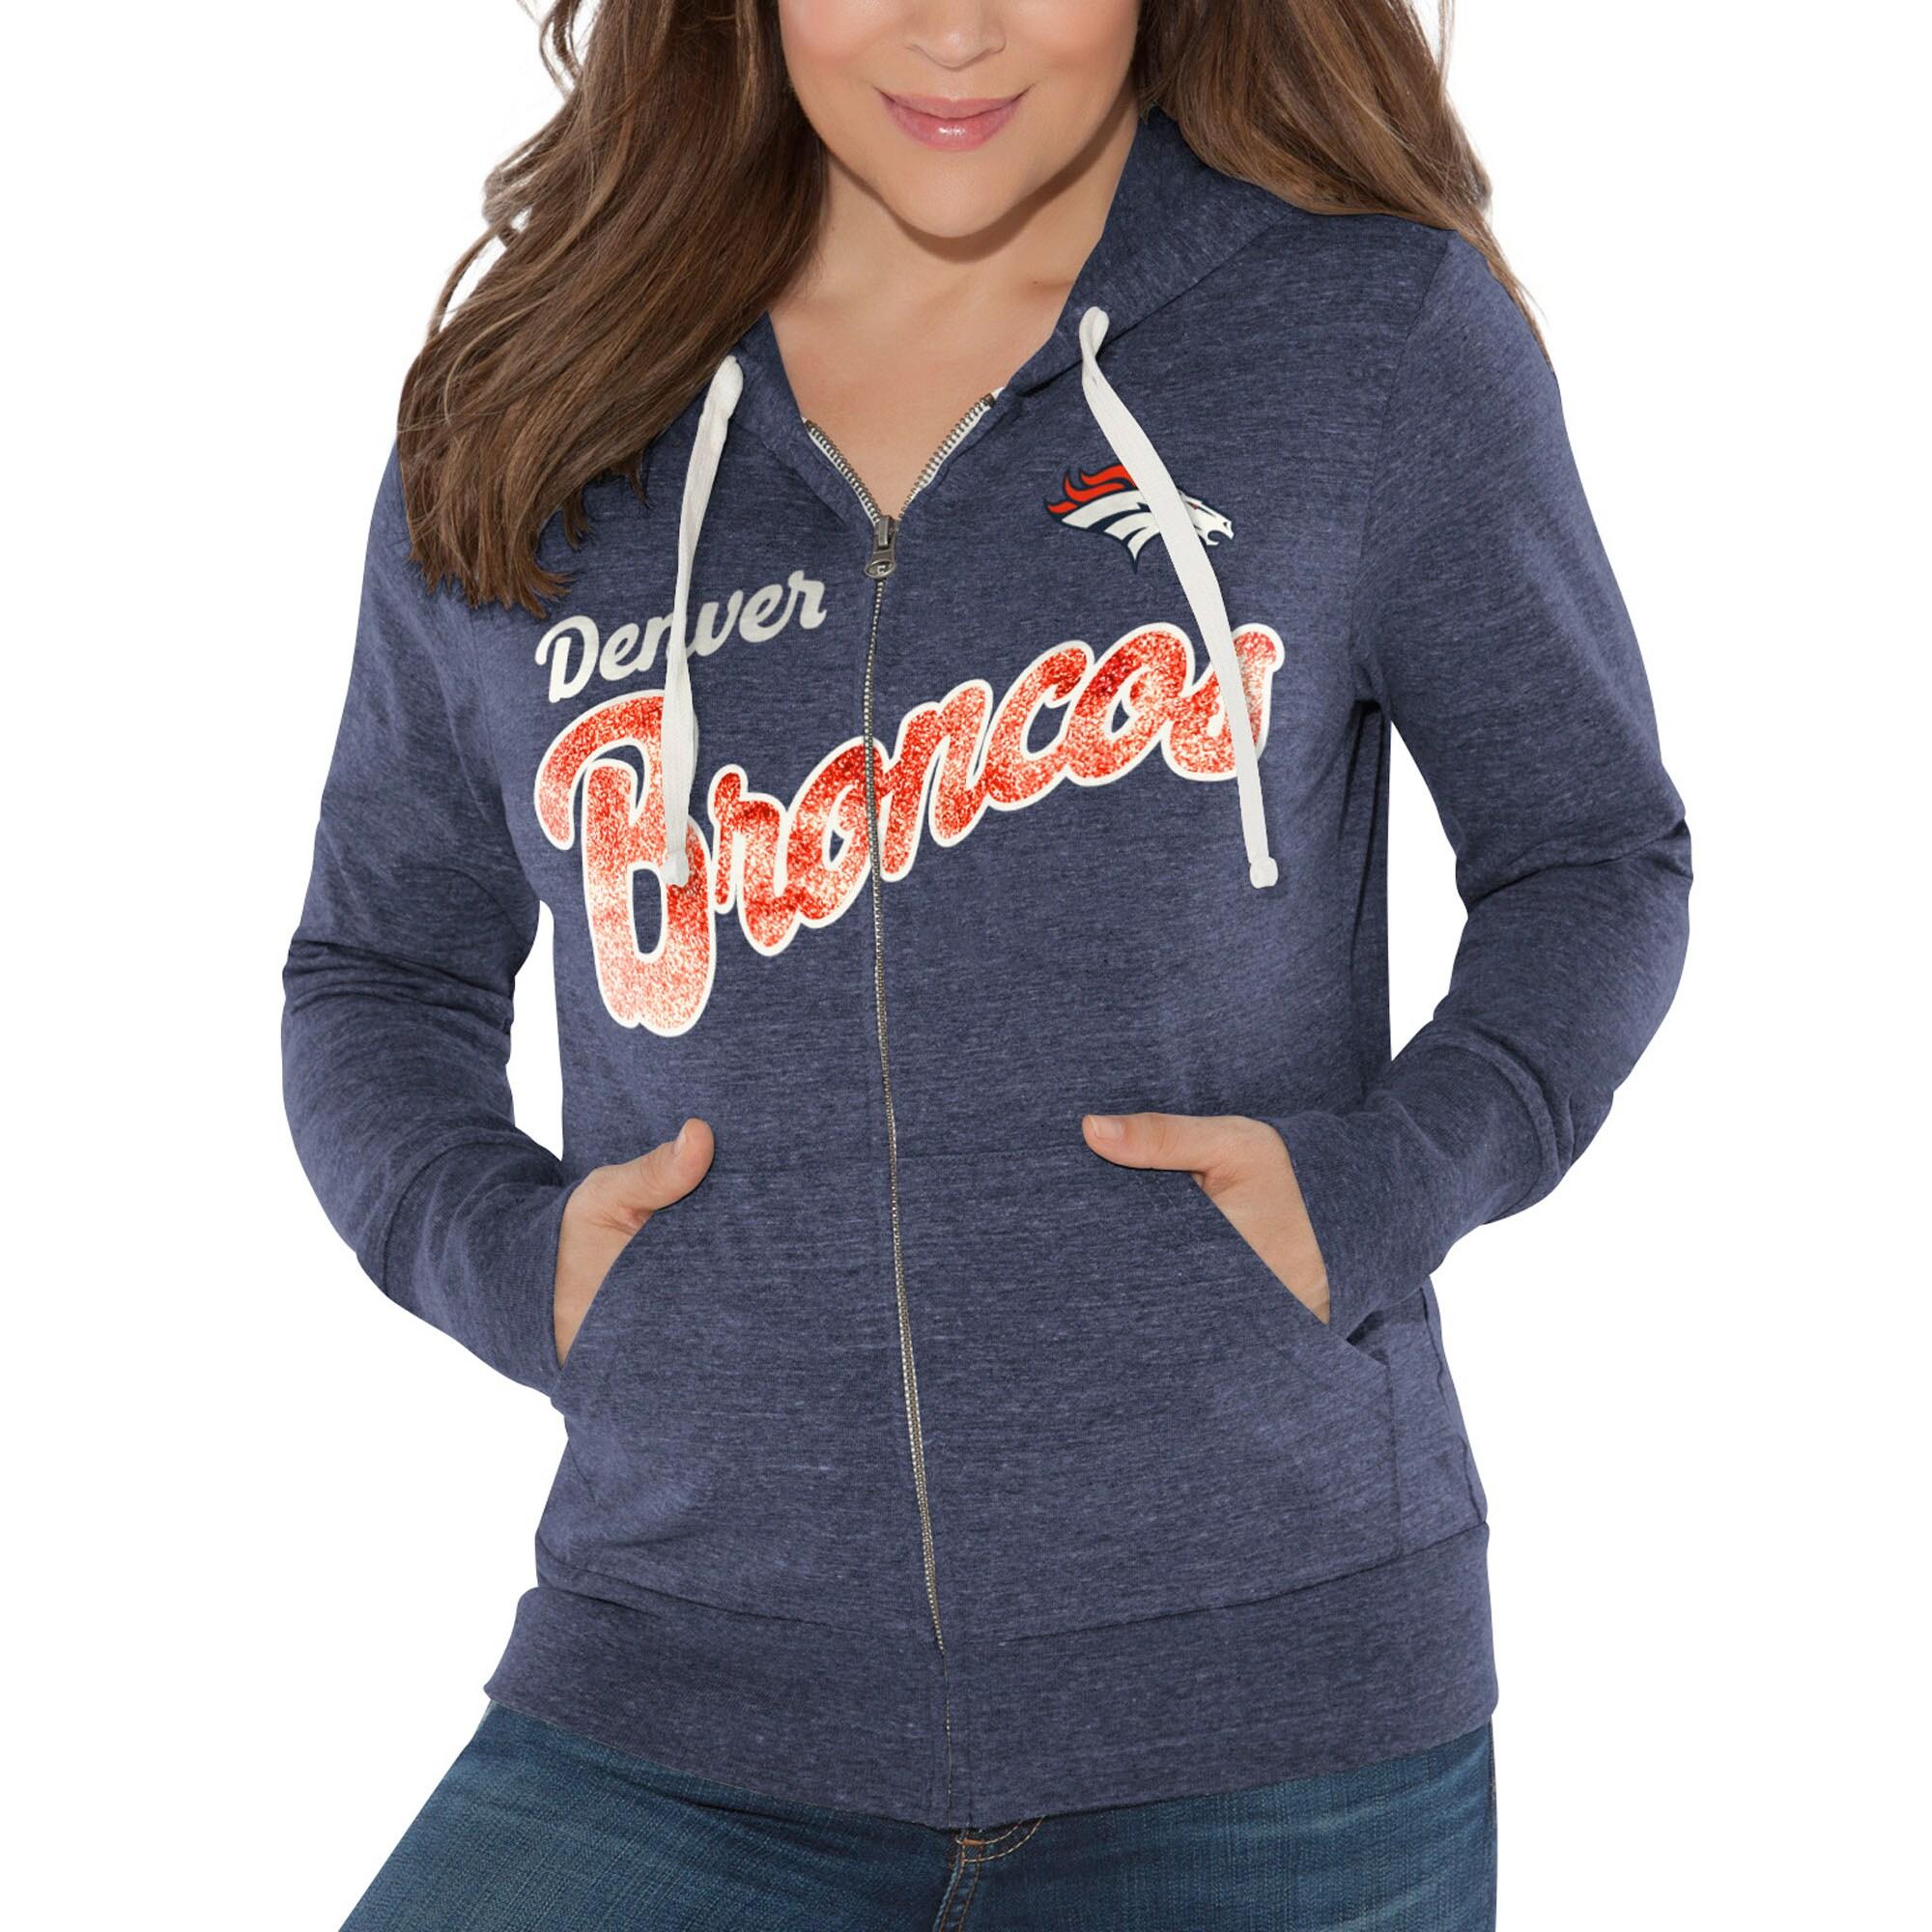 Denver Broncos Touch by Alyssa Milano Women's All American Full-Zip Hoodie - Navy